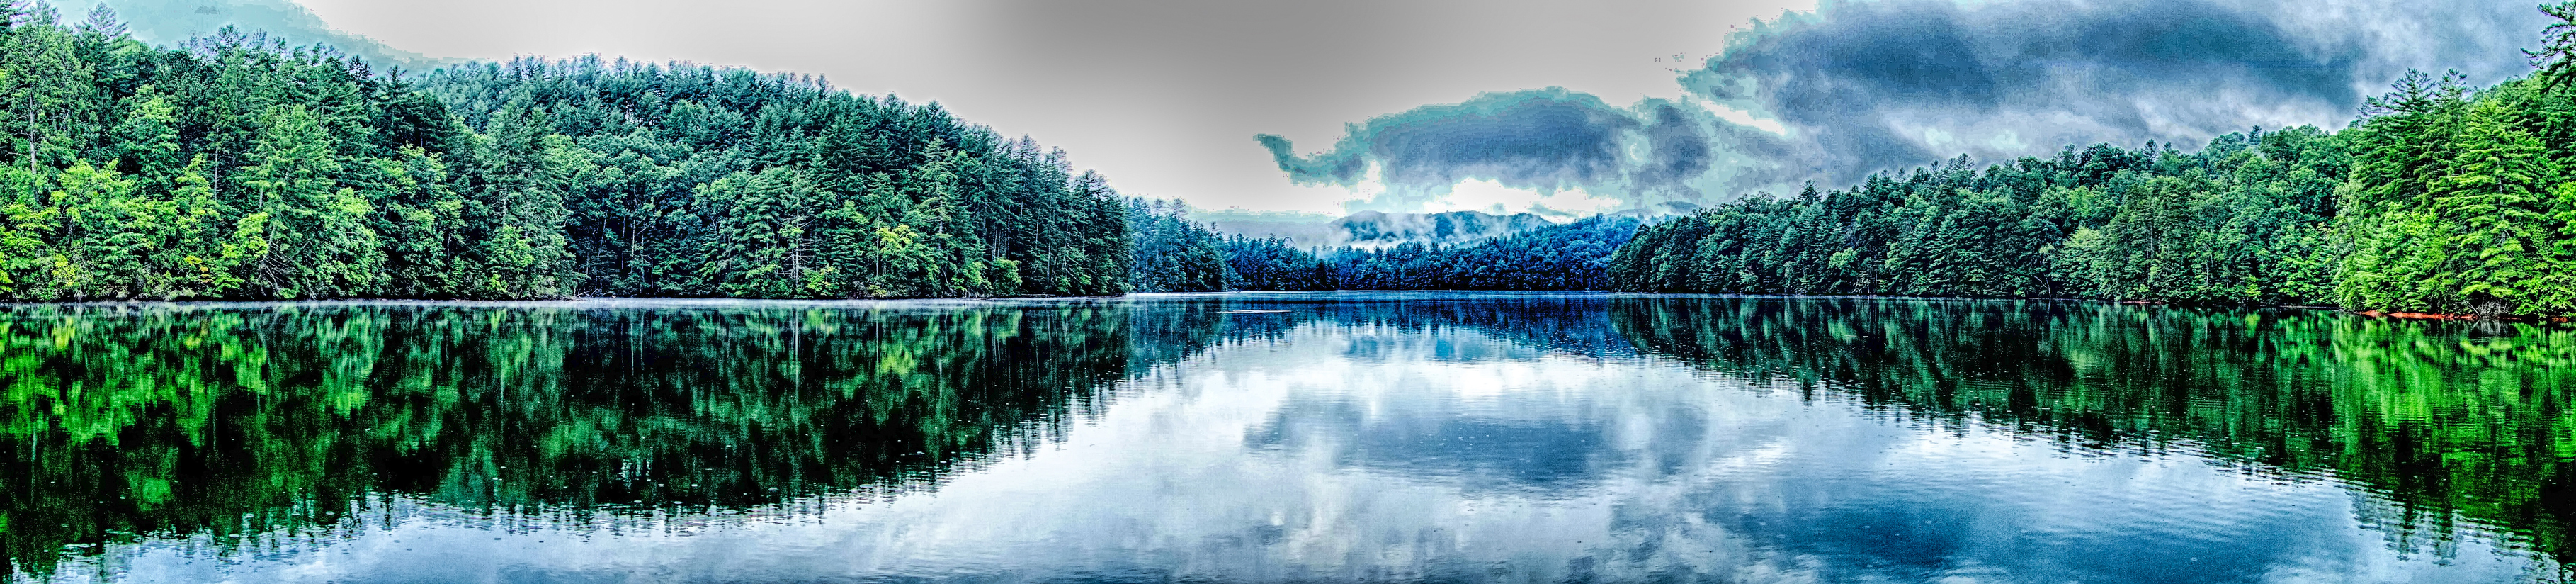 placid lake reflecting clouds